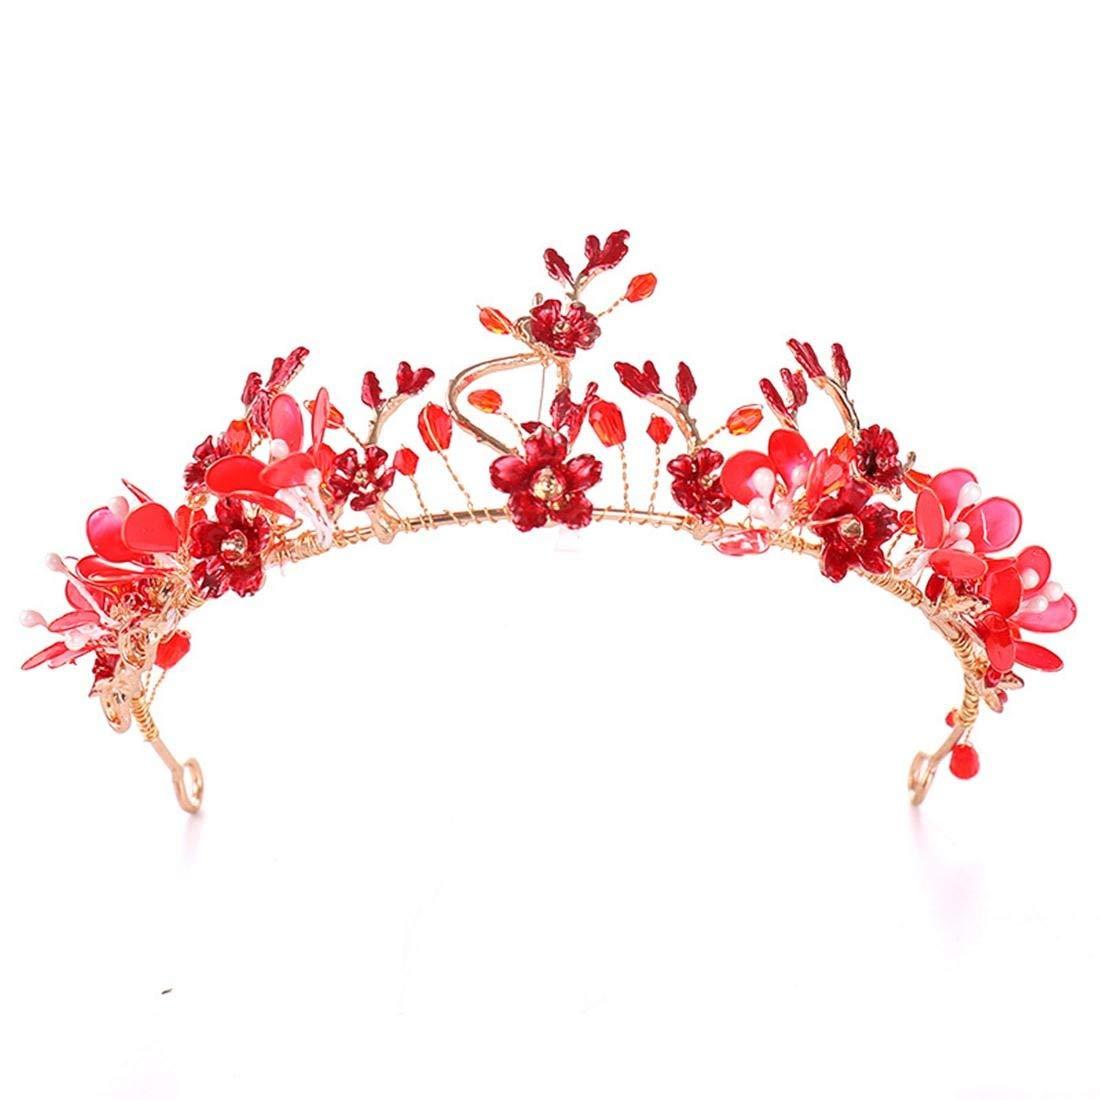 JIAJ Tiaras Crown Red Flower Wedding Party Festival Crown Accessory Banquet Show Headdress (Color : Red) by JIAJ